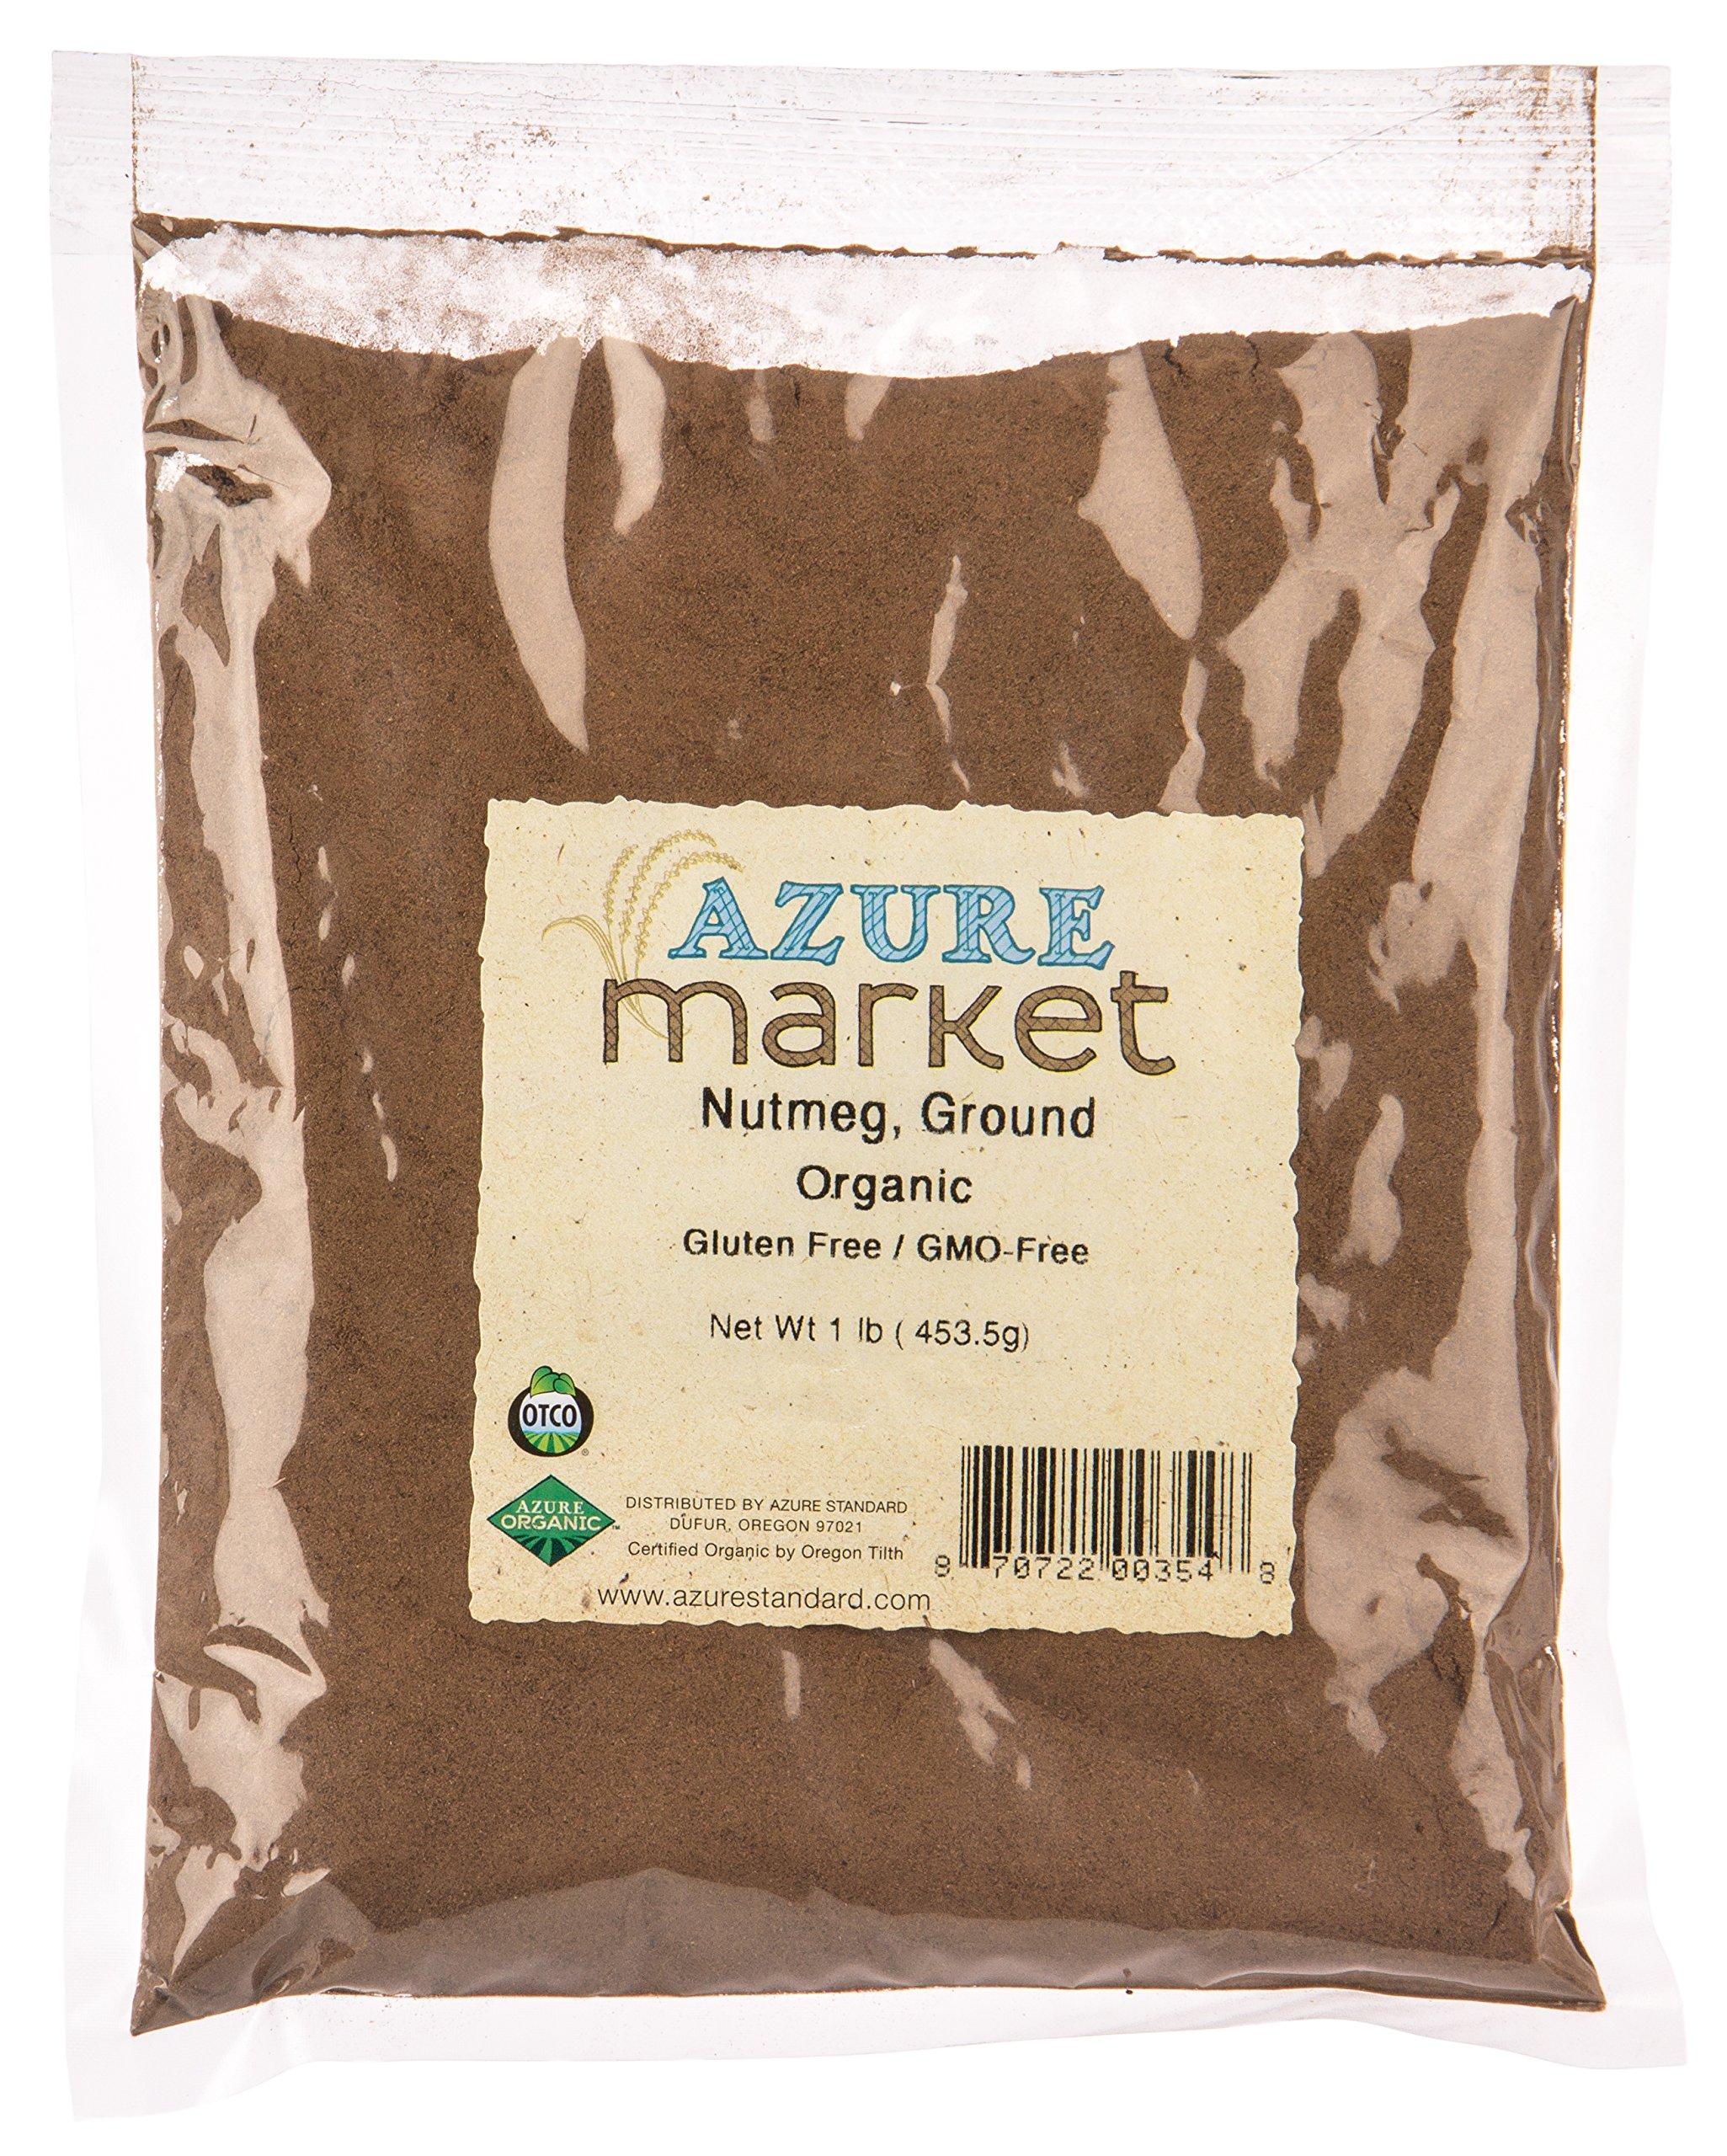 Azure Market Organics Nutmeg, Ground, Organic - 1 lb